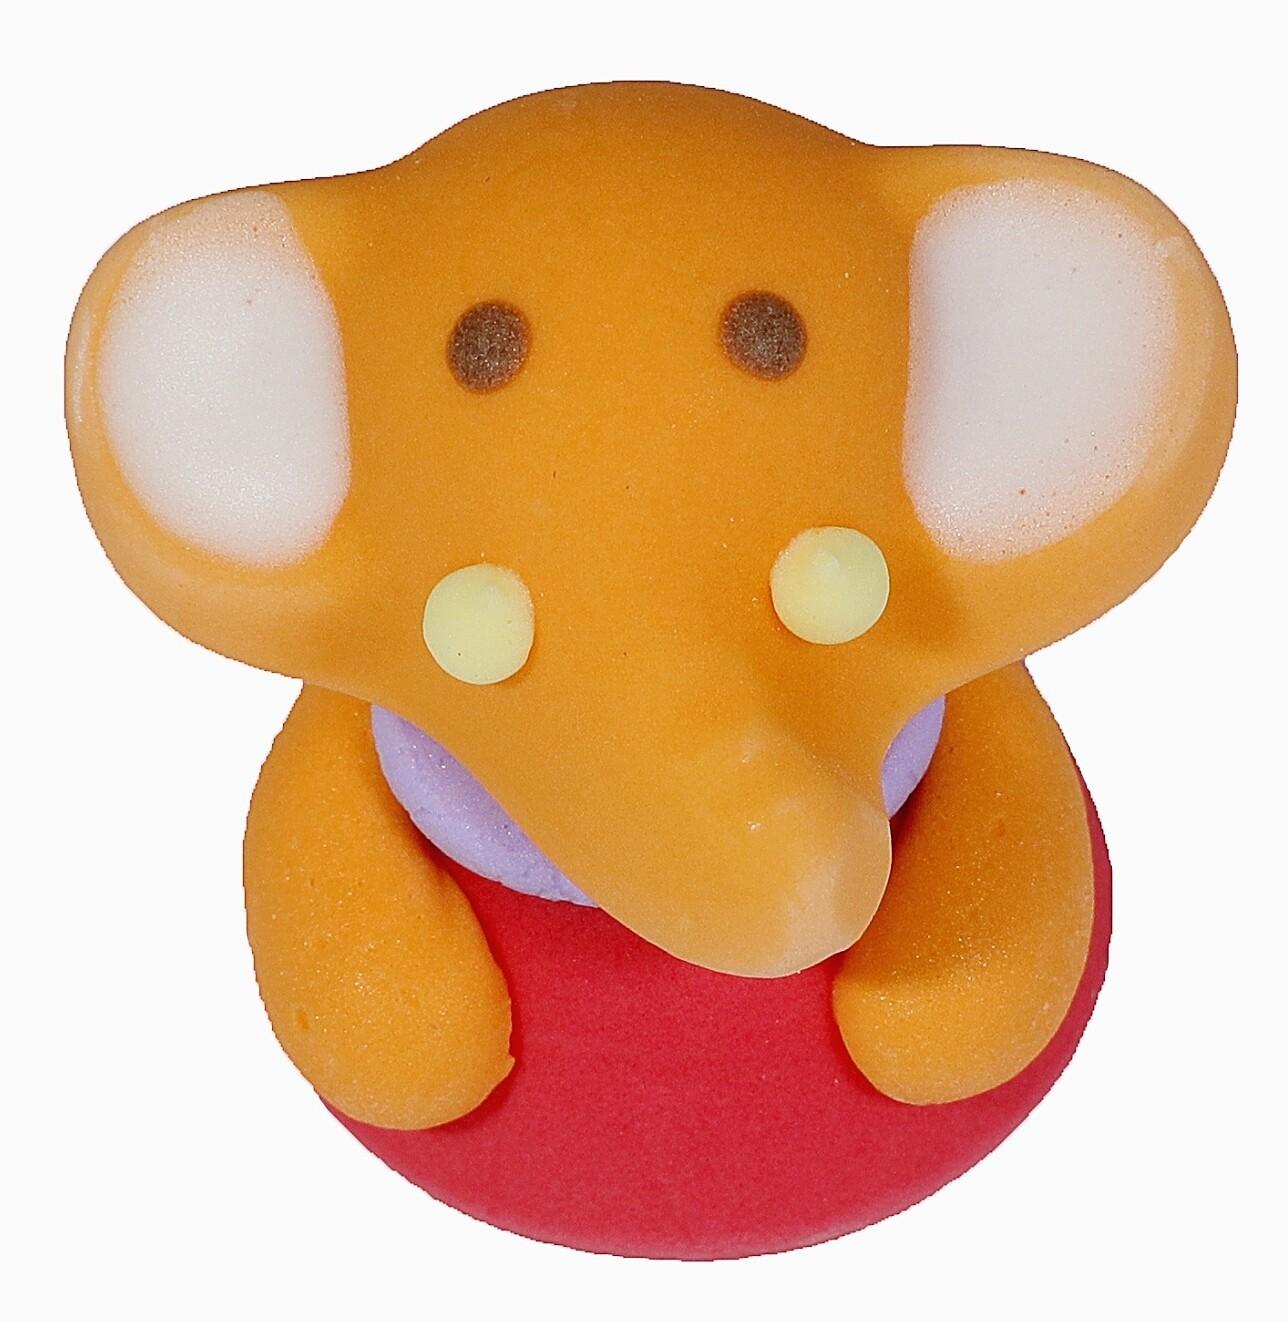 Adorable Elephant (Baker's Sugar)